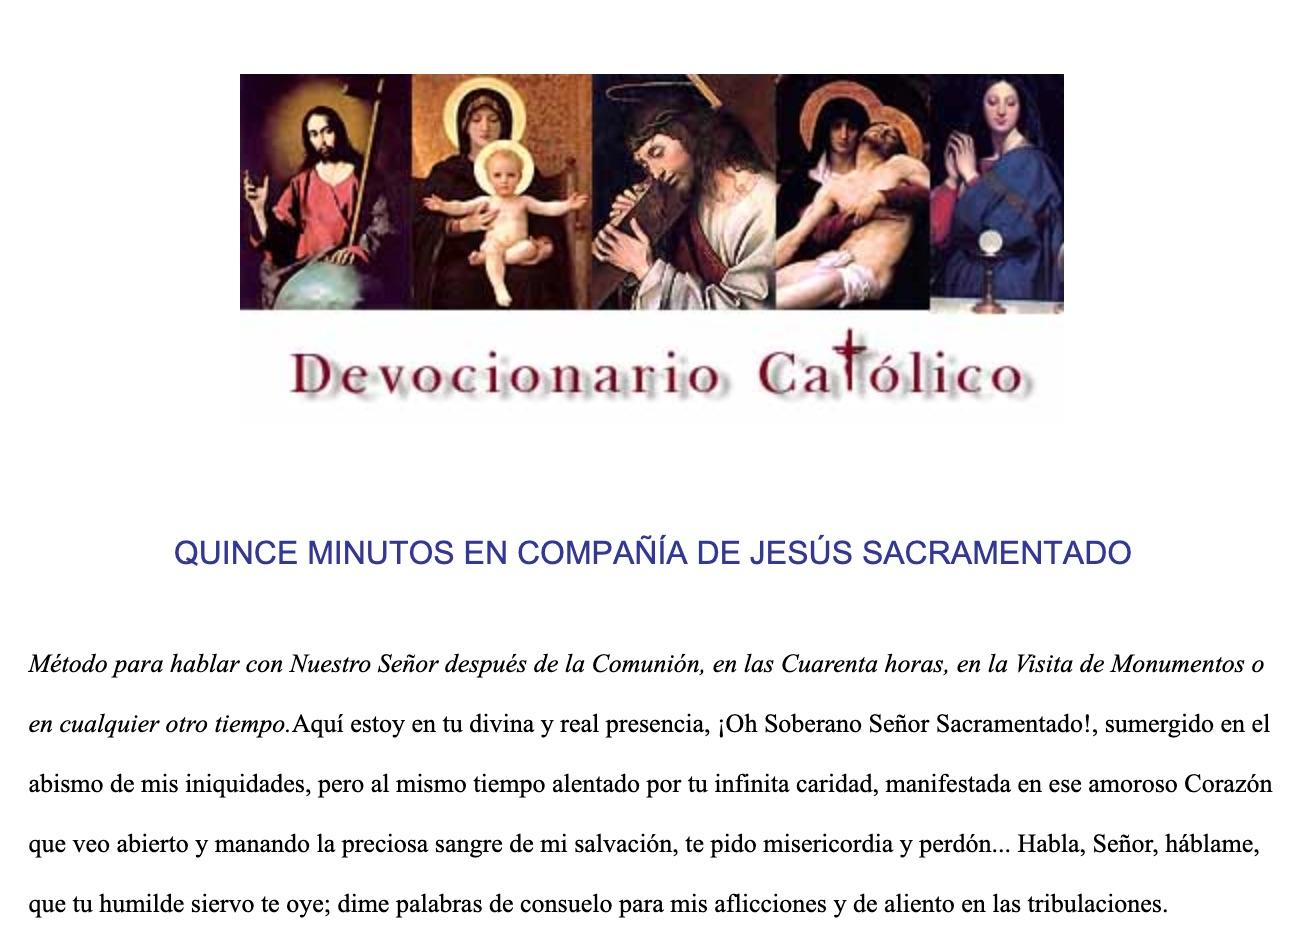 Devocionario Catolico.jpg